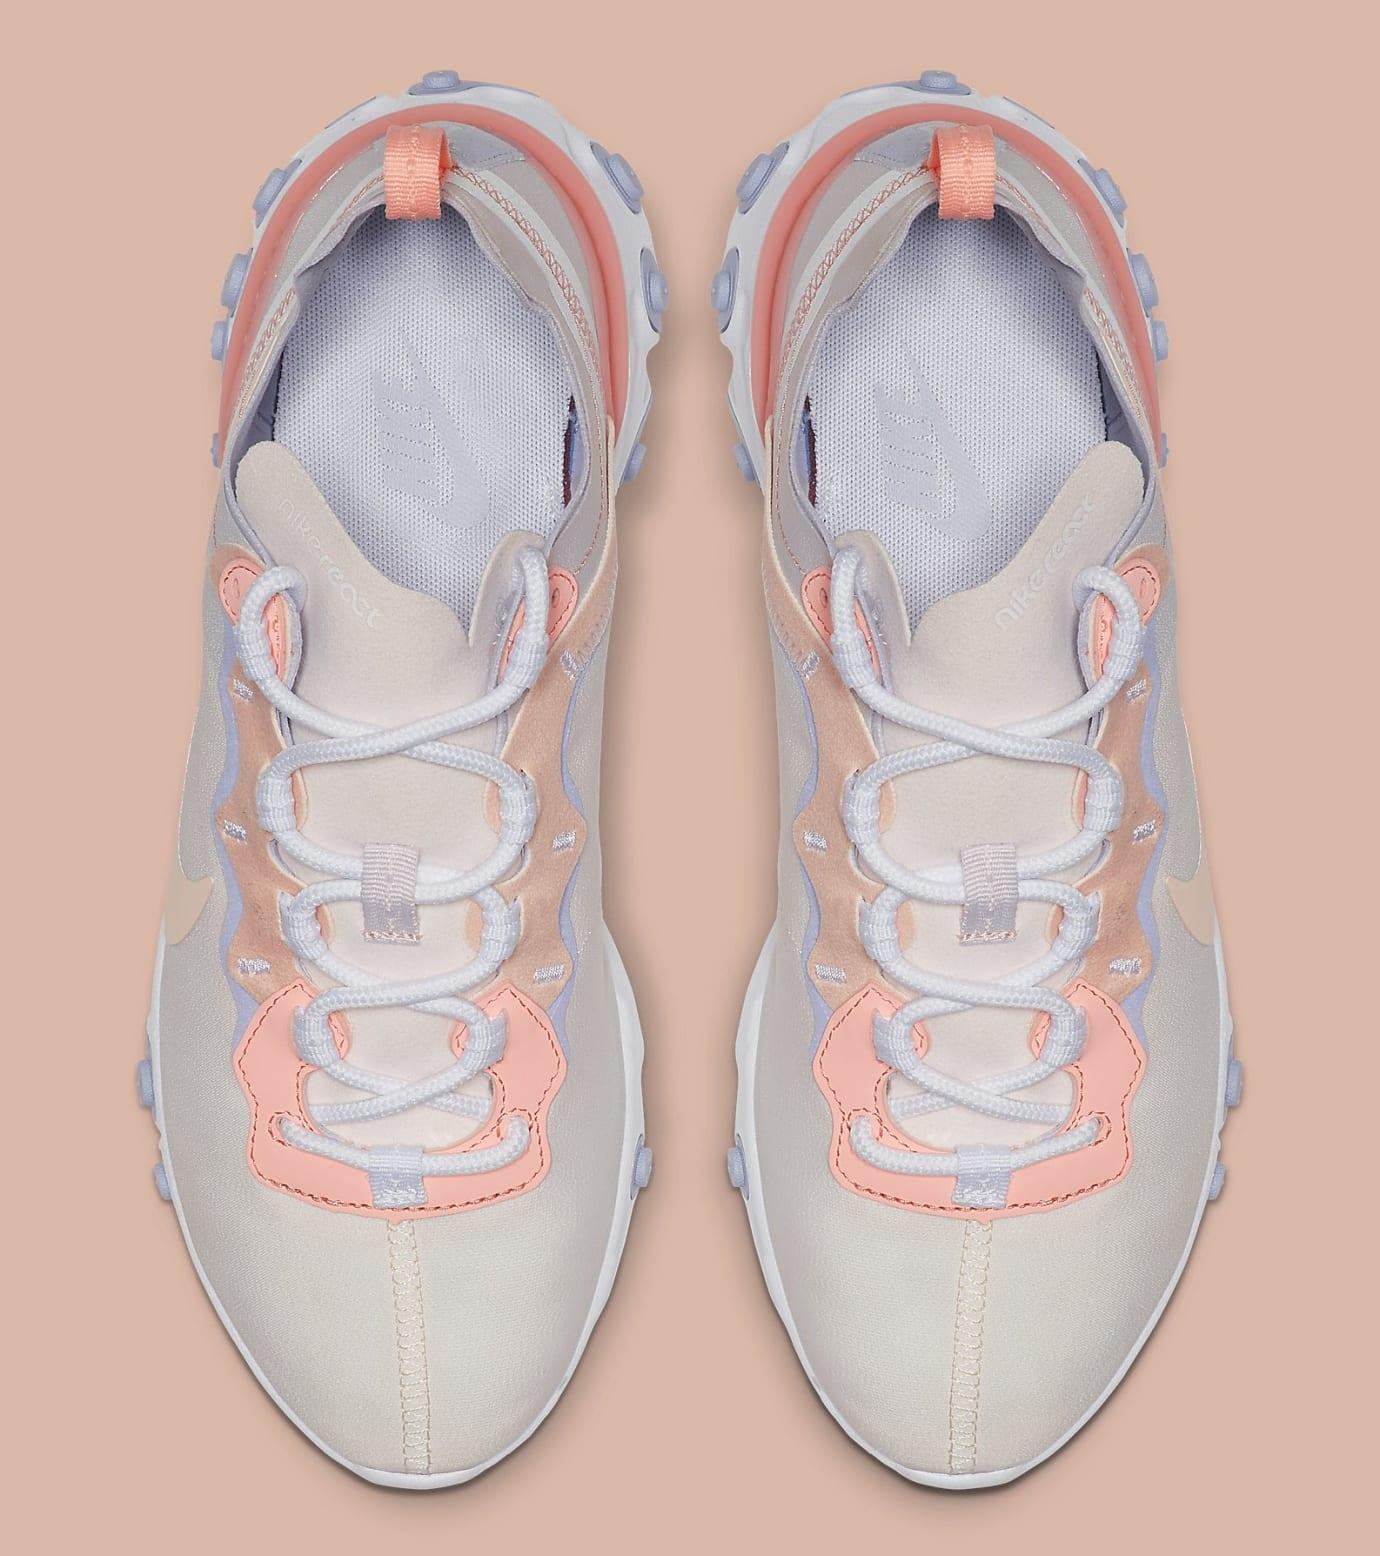 Nike Women's React Element 55 'Pale Pink' BQ2728-601 Top